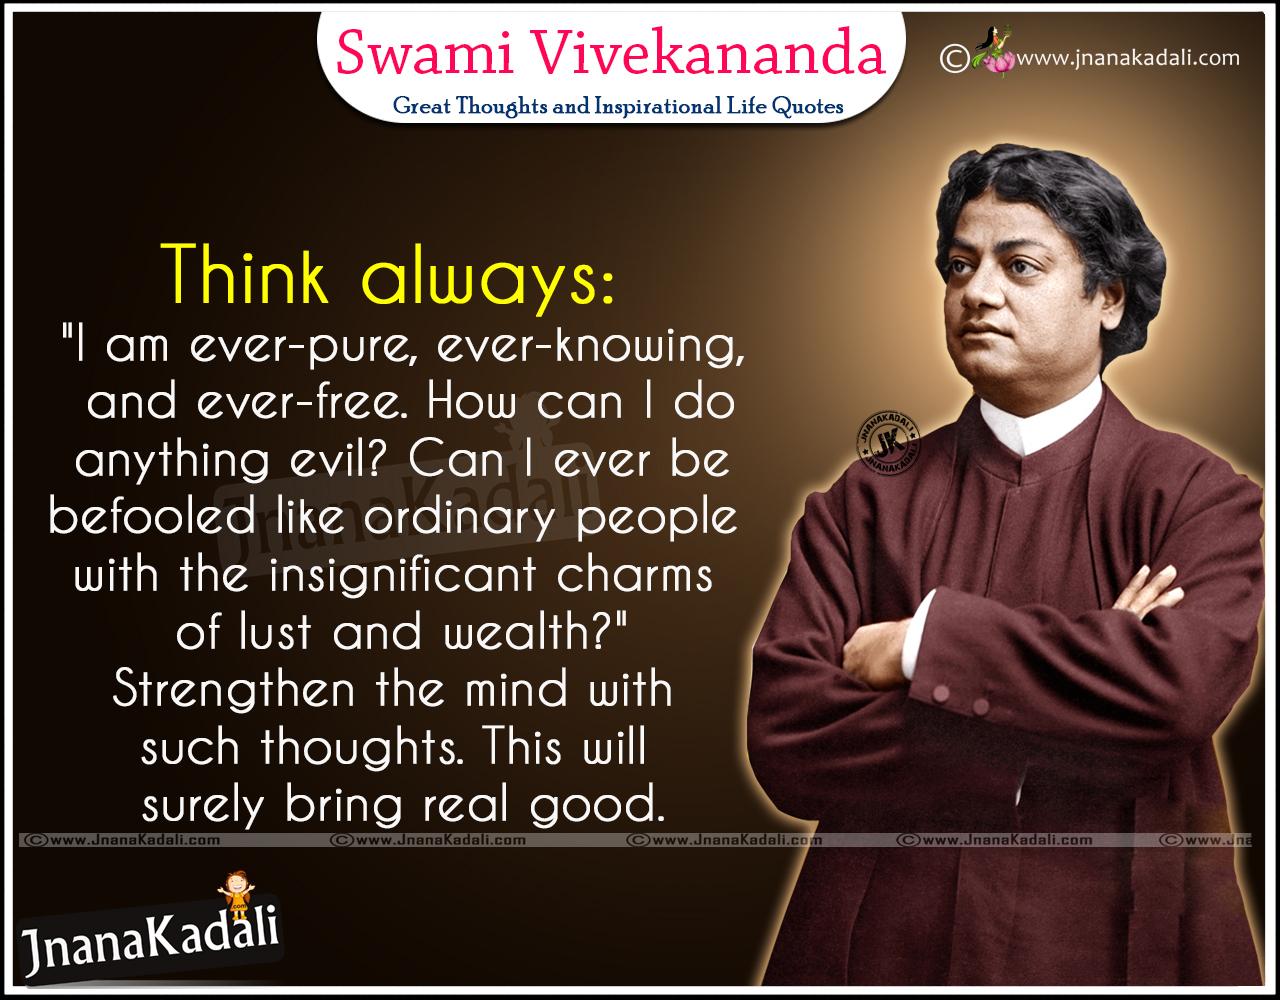 Swami Vivekananda Great Success inspirational Quotes and